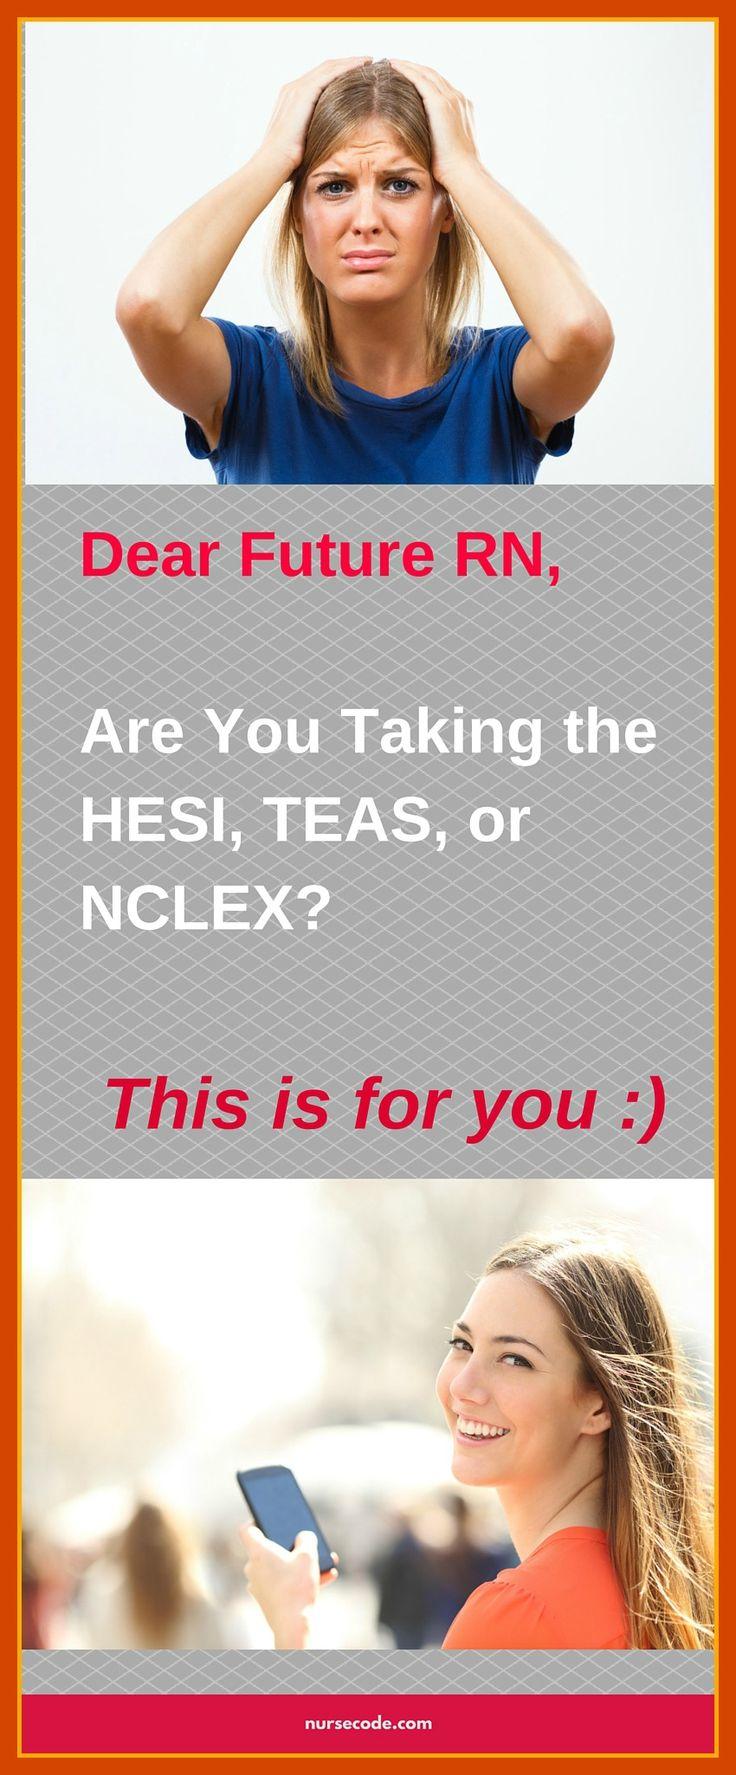 NCLEX Study Guide | Nursing.org